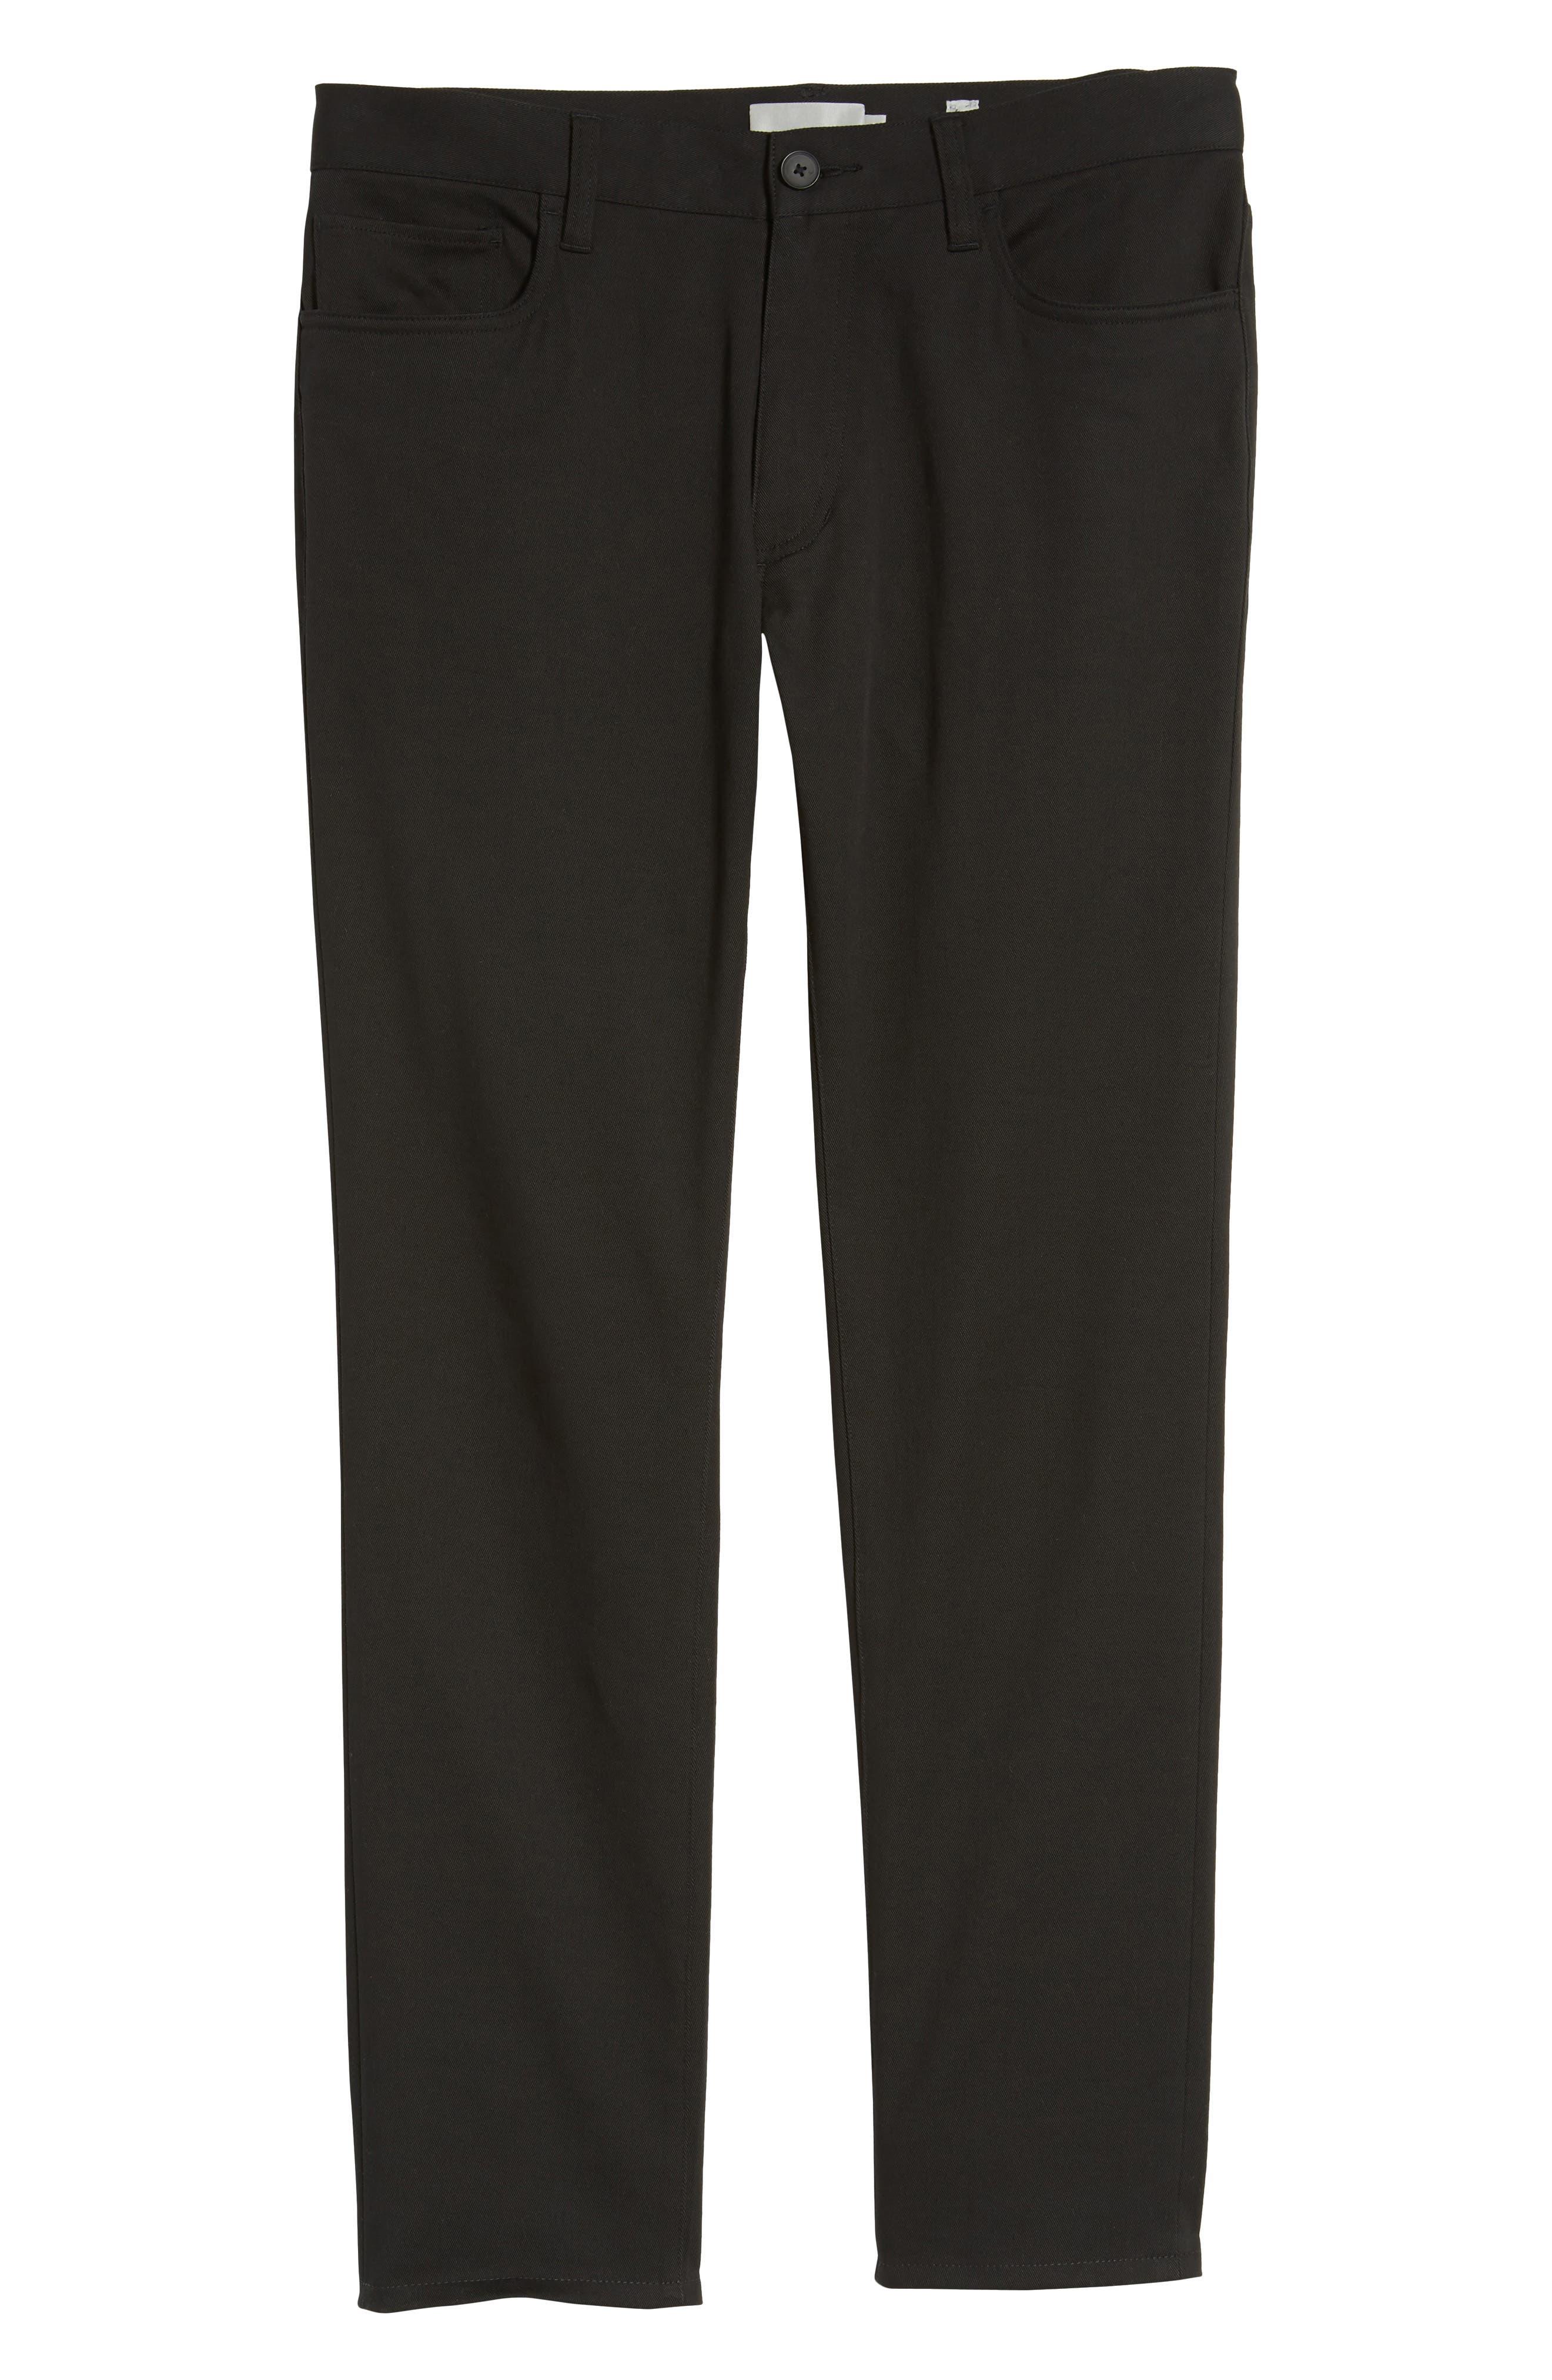 Skinny Slim Fit Pants,                             Alternate thumbnail 6, color,                             001